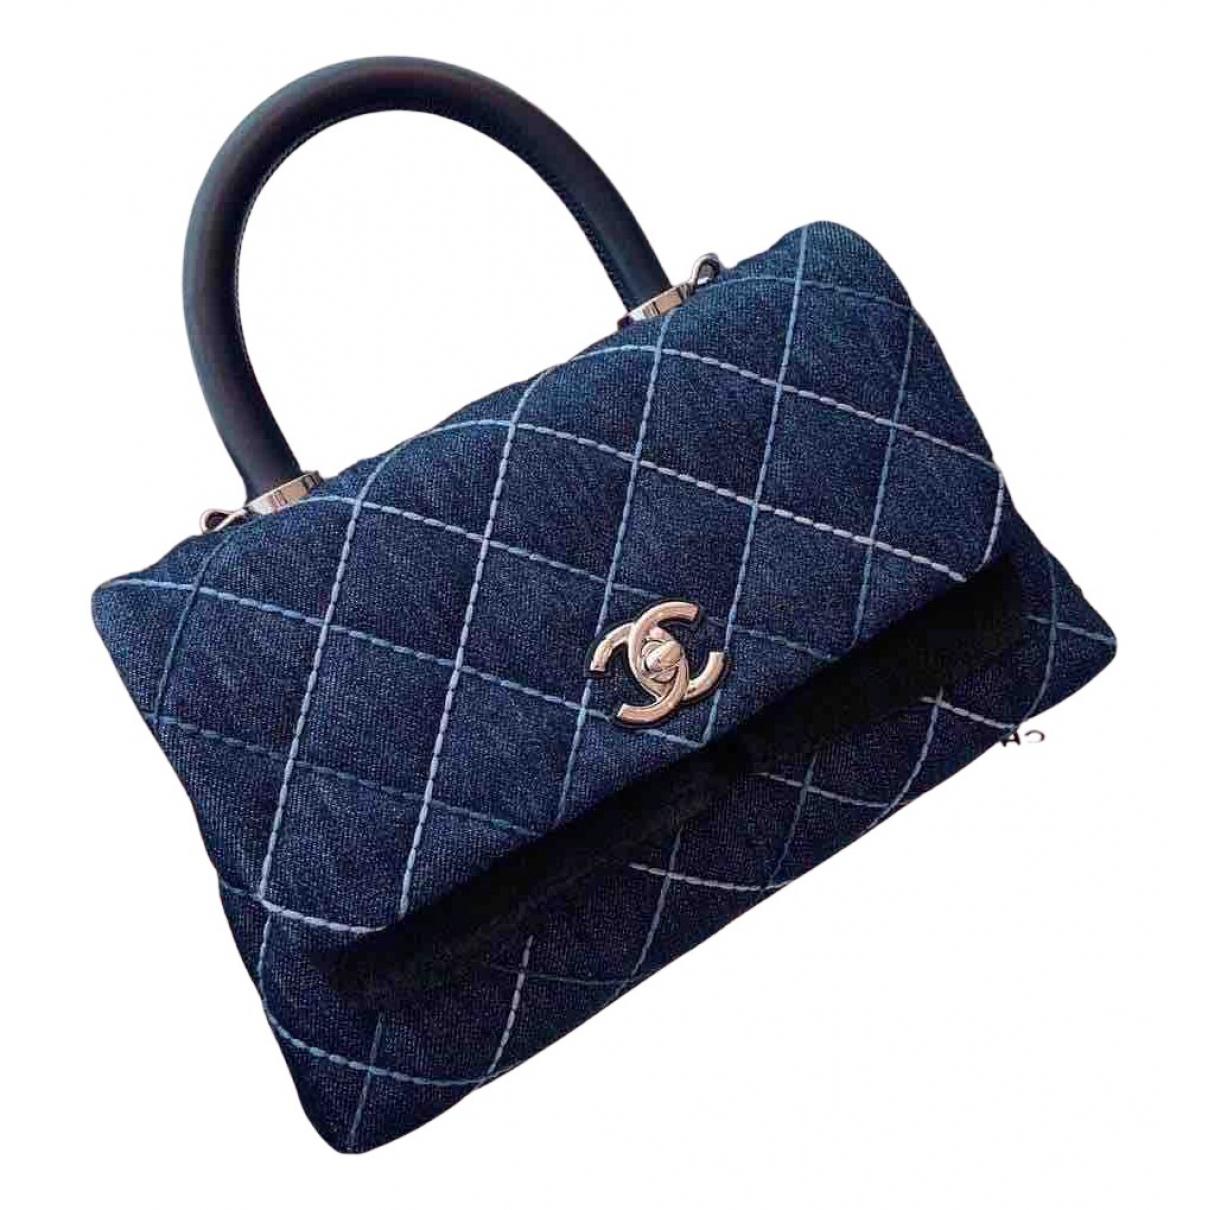 Chanel Coco Handle Blue Denim - Jeans handbag for Women N